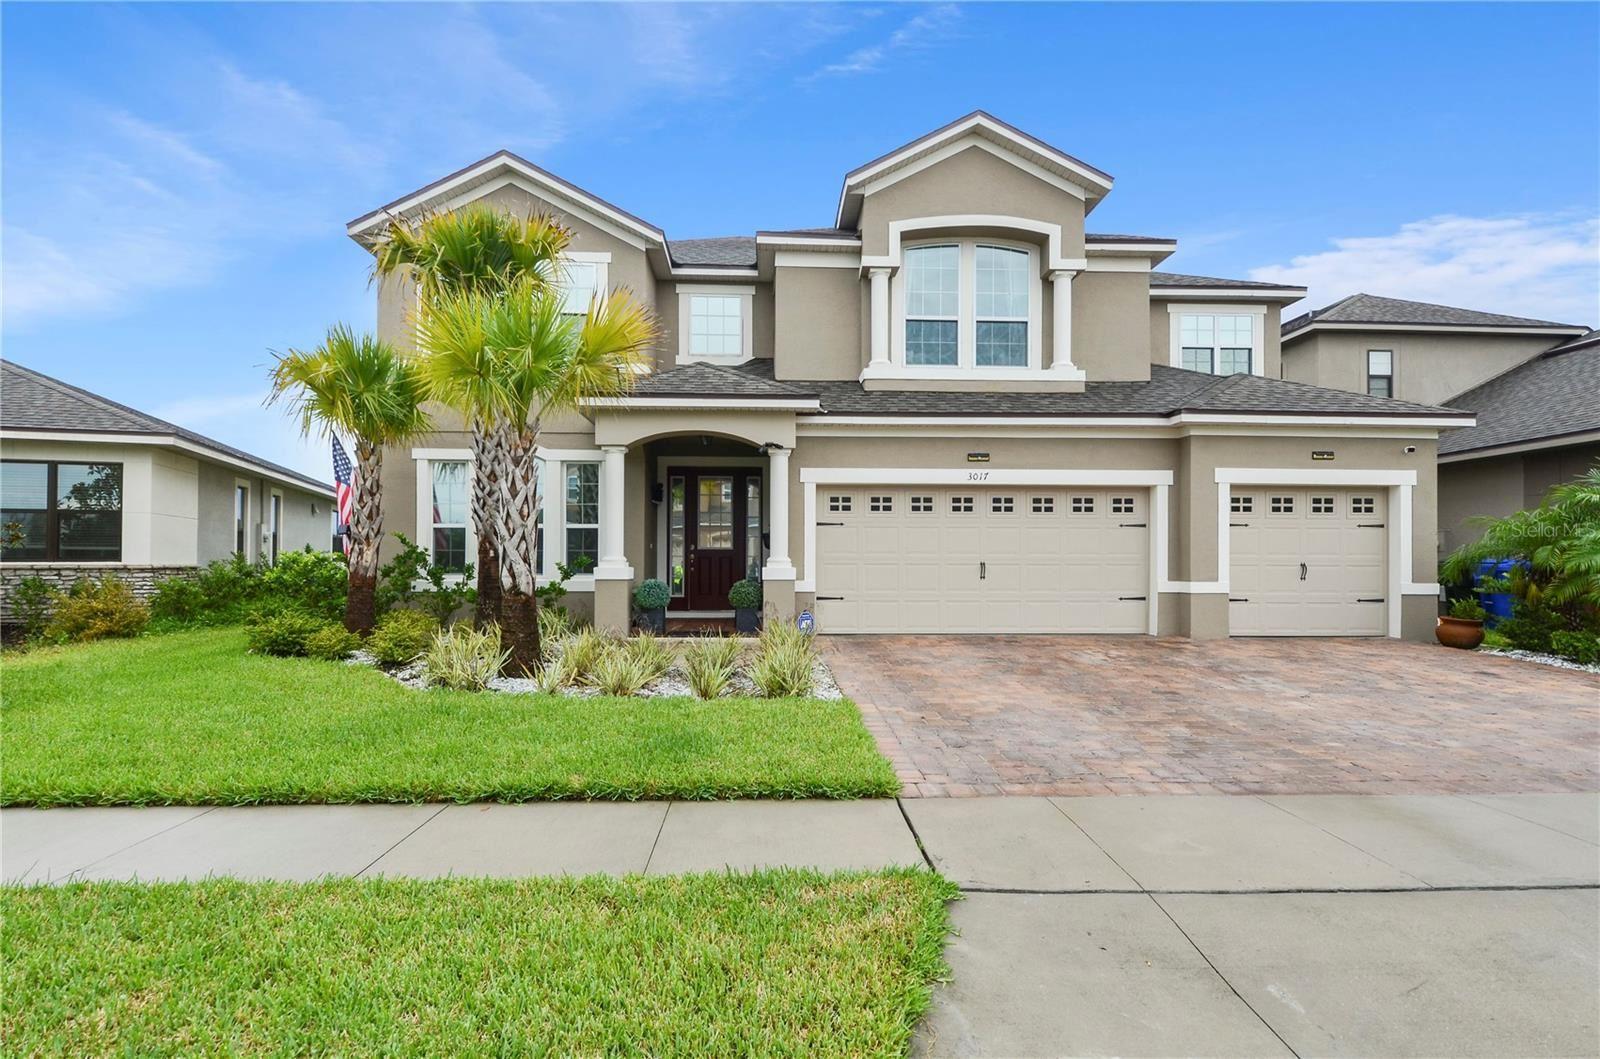 3017 CARDILLINO WAY, Kissimmee, FL 34741 - #: O5963072